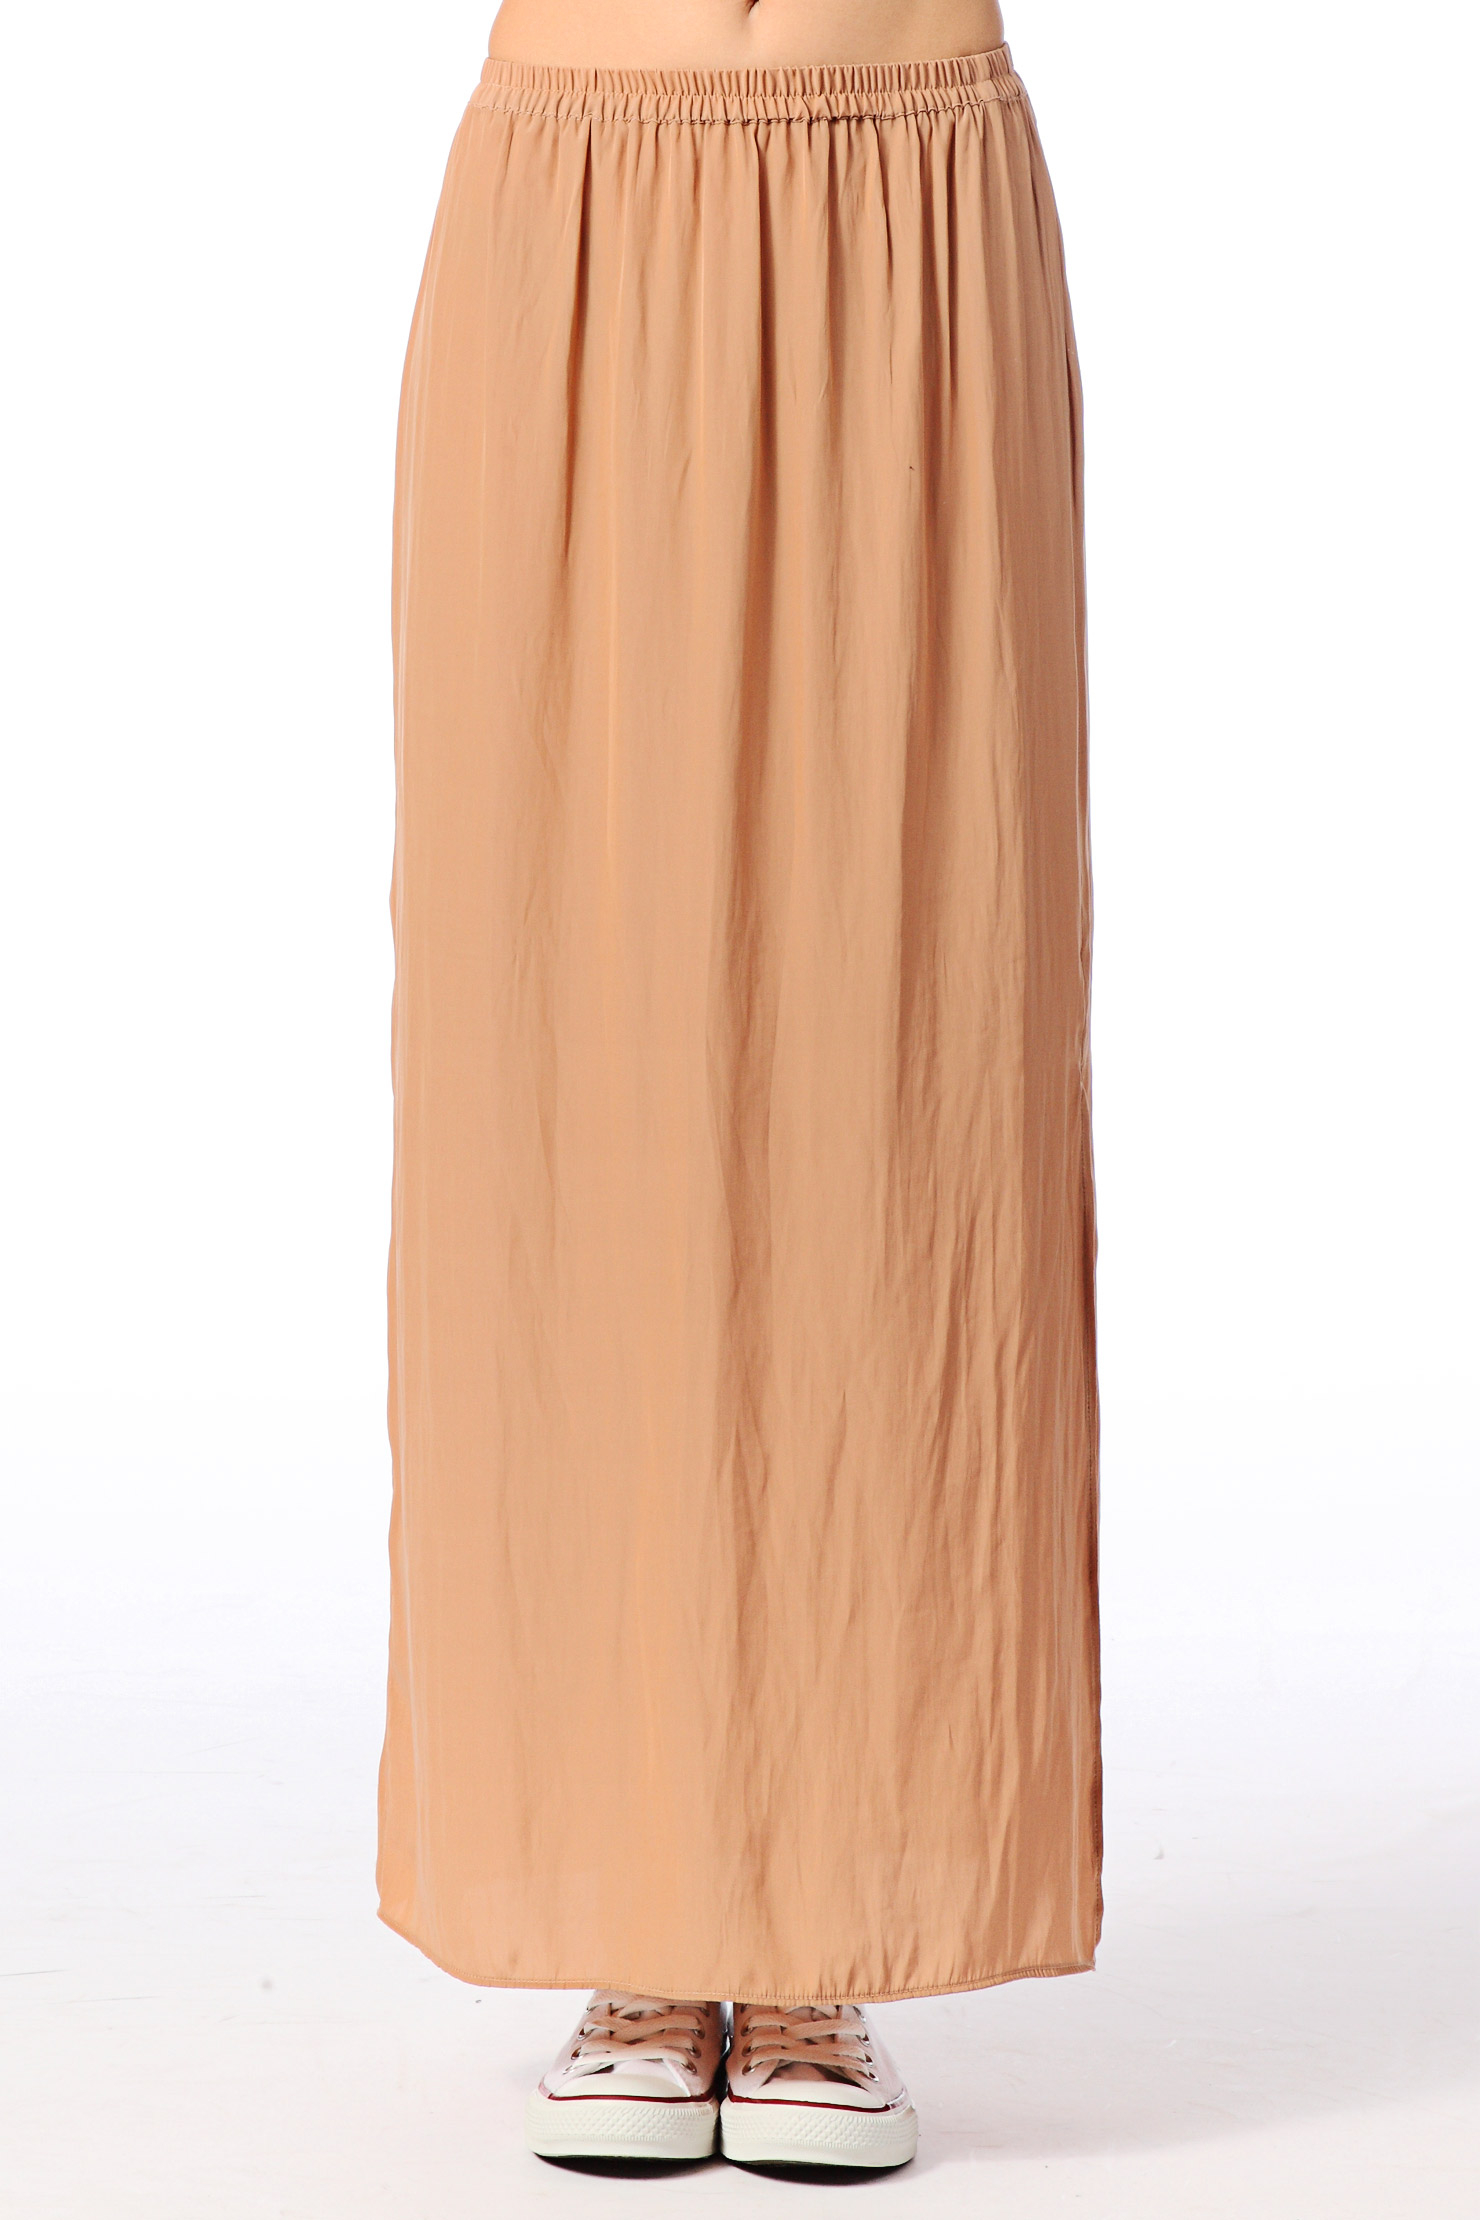 american vintage midi skirt maxi skirt zac186be14 in brown